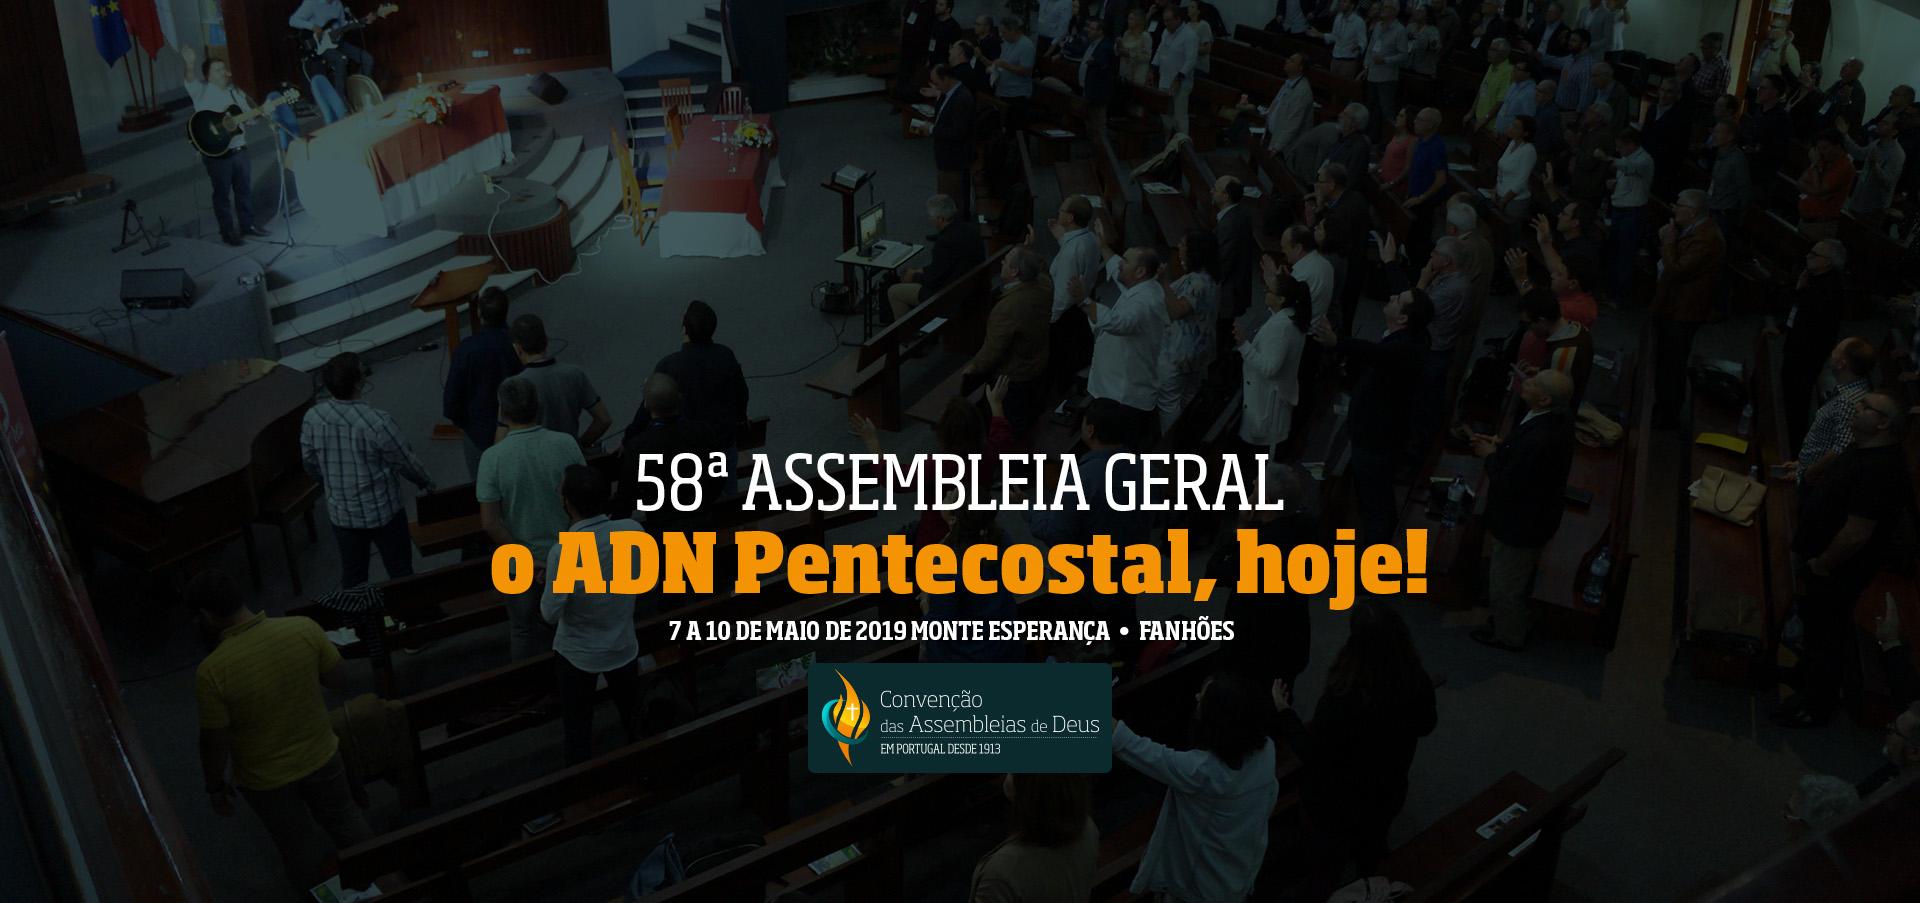 Slideshow – 58 Assembleia Geral